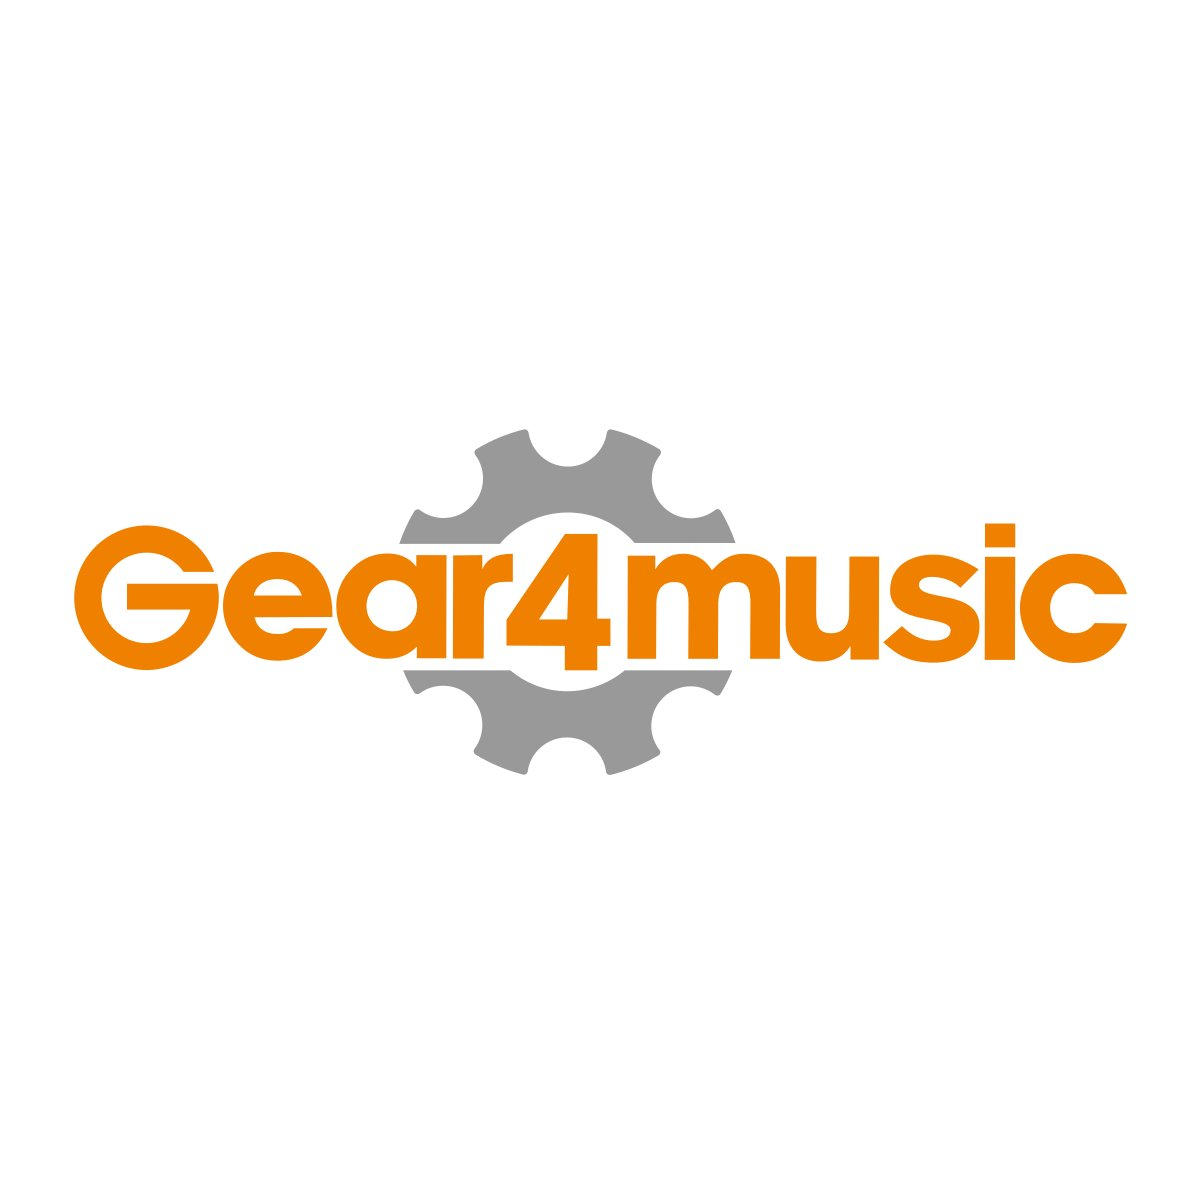 pack guitare lectrique la par gear4music red ampli. Black Bedroom Furniture Sets. Home Design Ideas